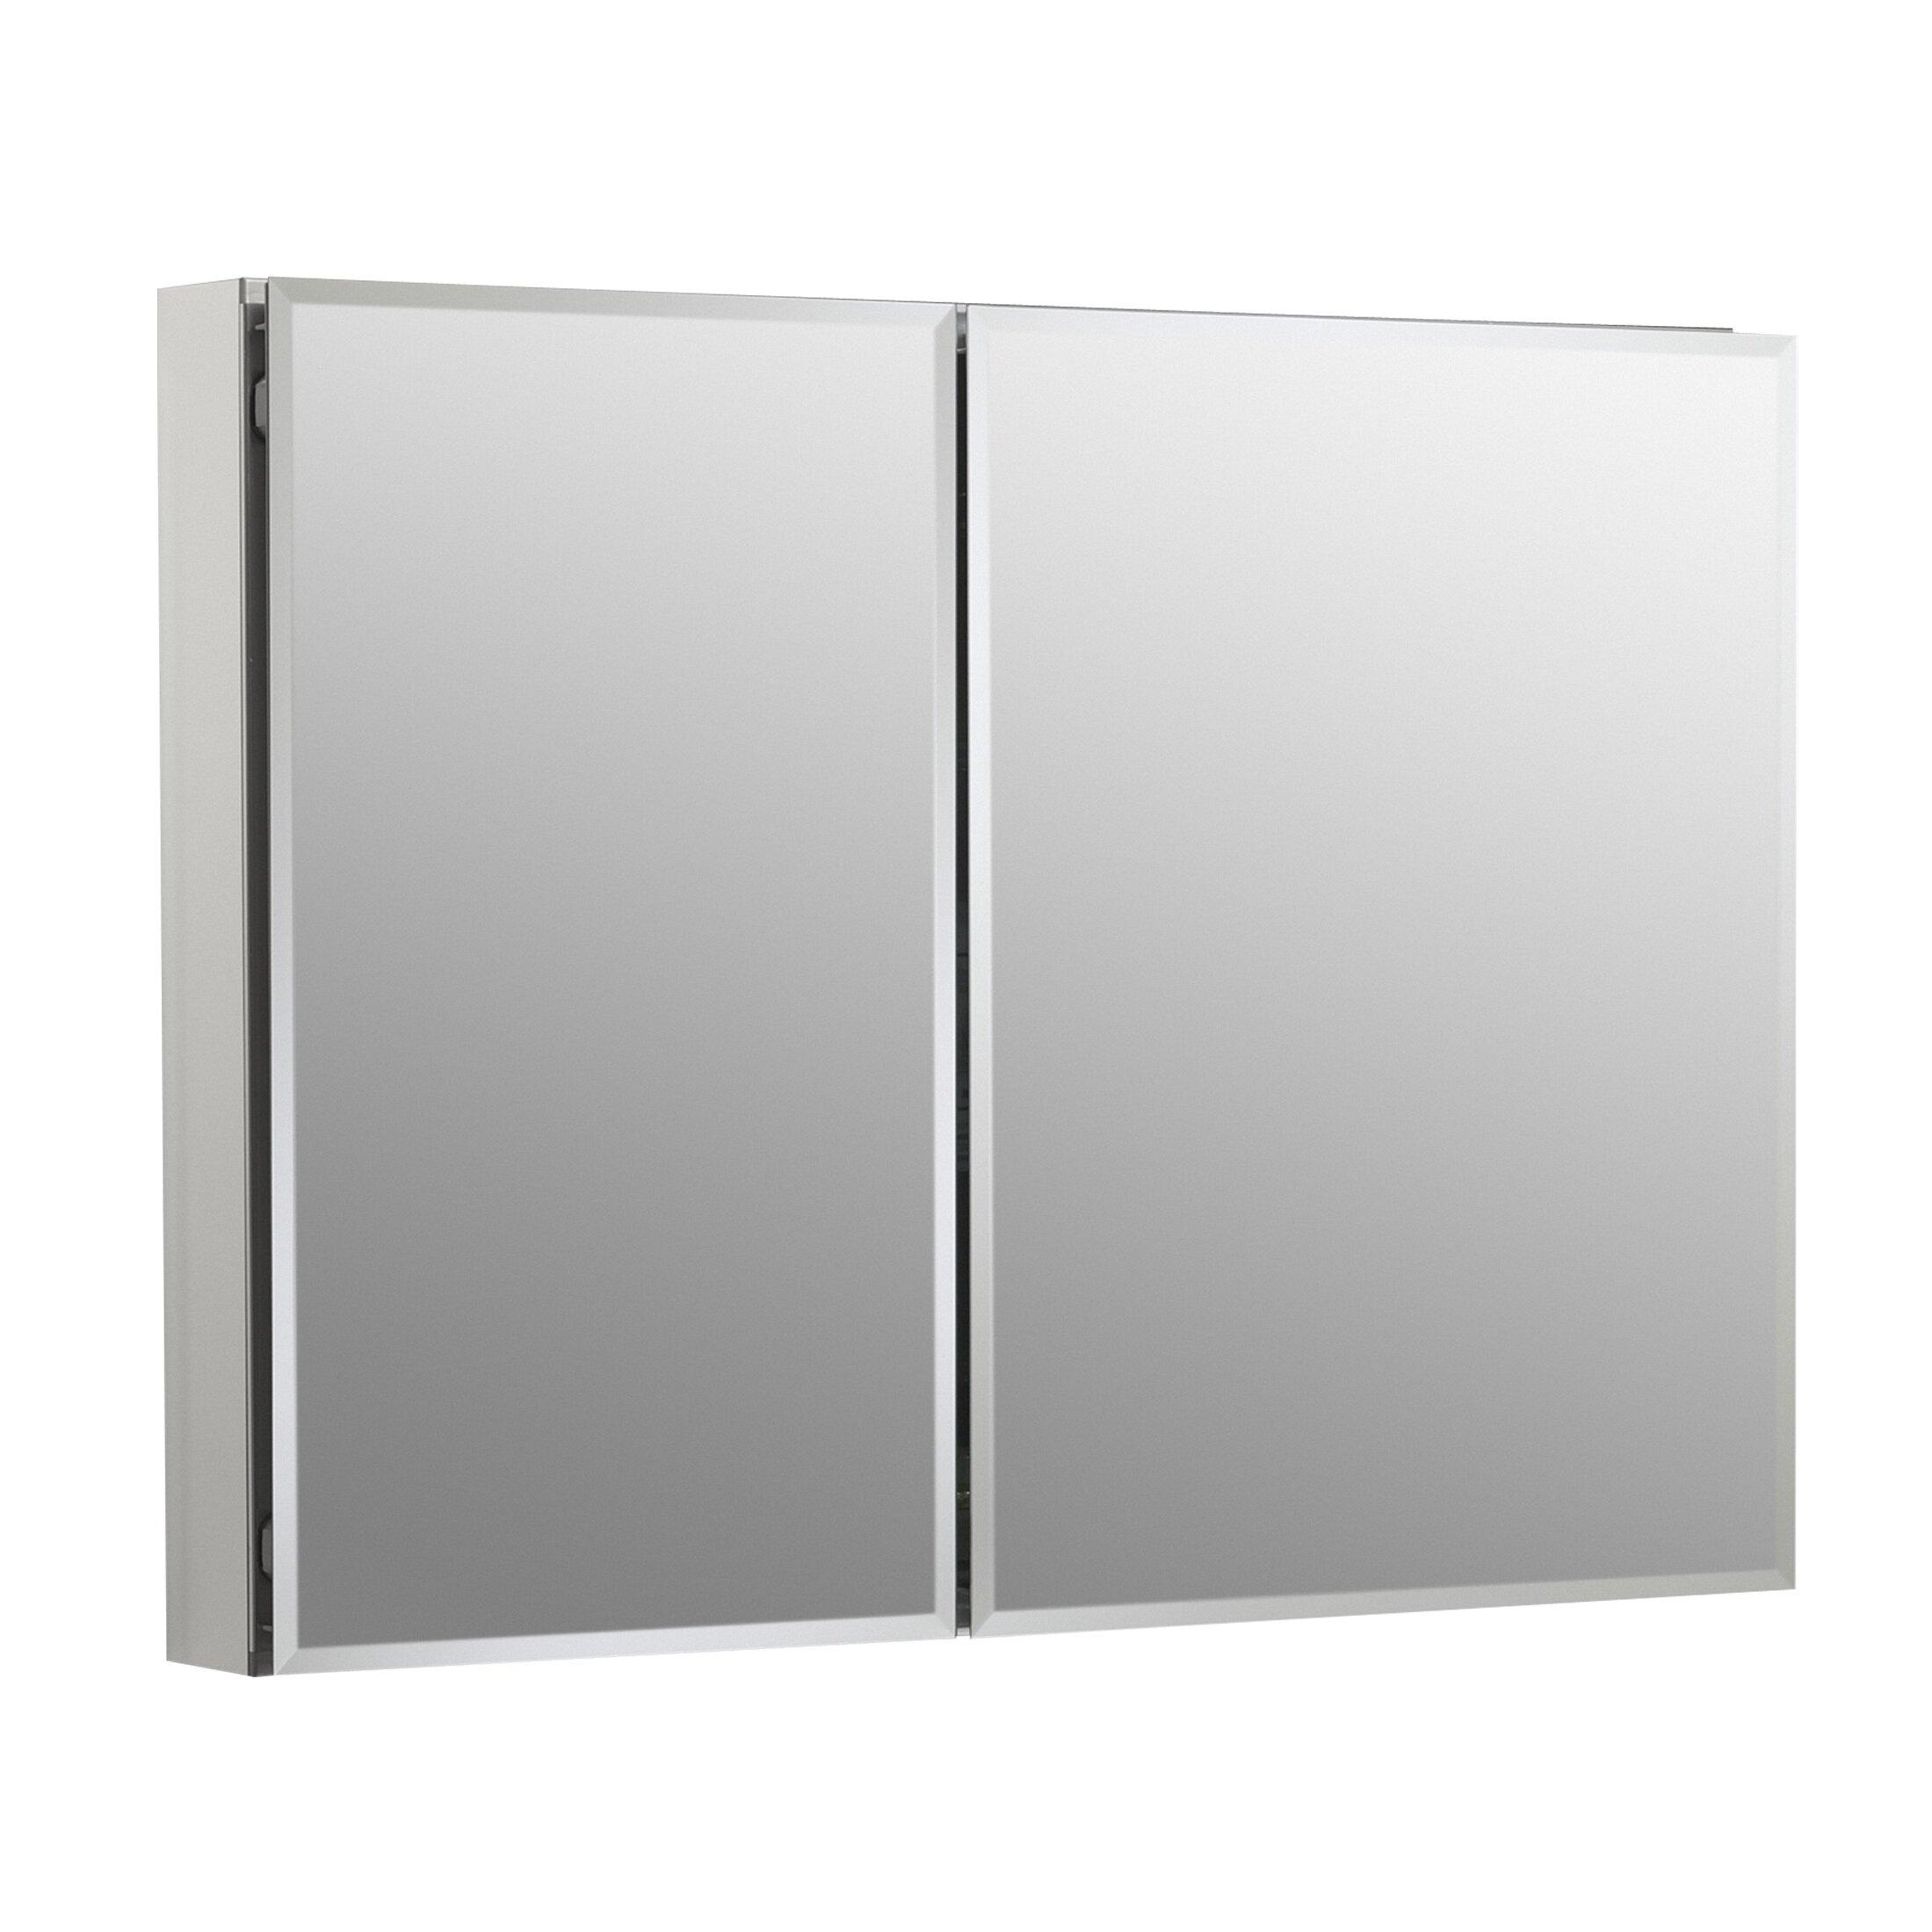 Kohler 35 Quot W X 26 Quot H Aluminum Two Door Medicine Cabinet